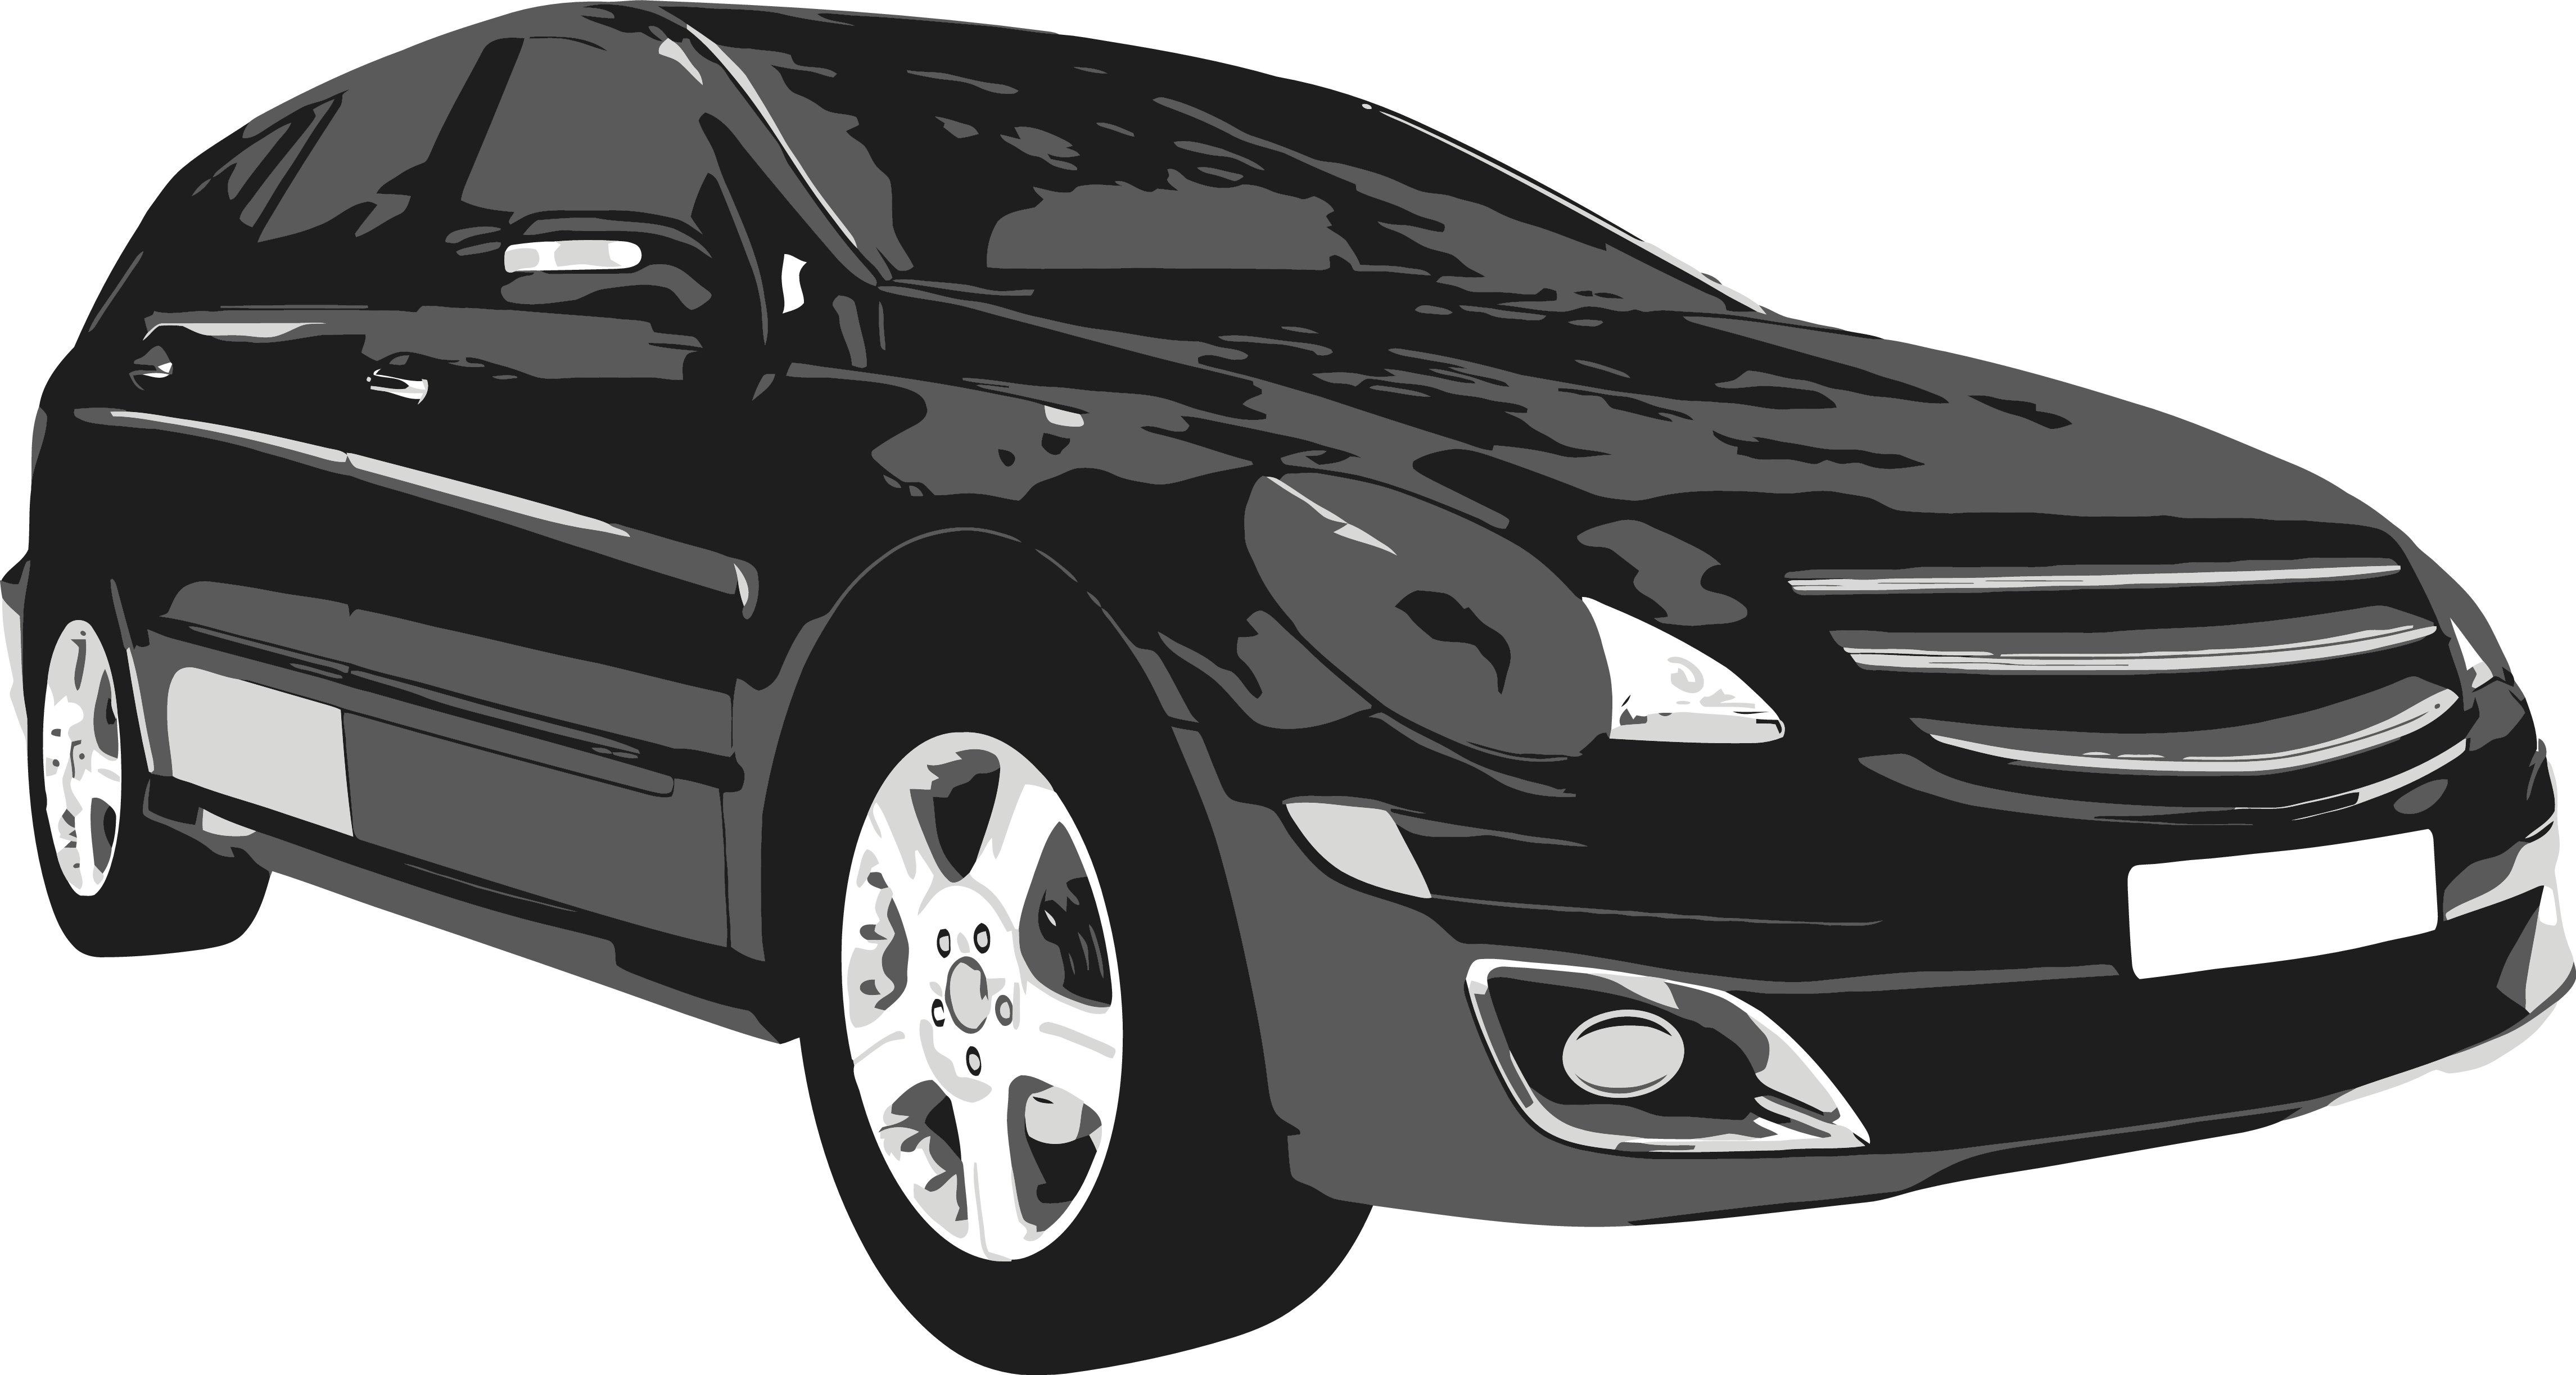 porsche verbannt den saugmotor aus dem 911er. Black Bedroom Furniture Sets. Home Design Ideas